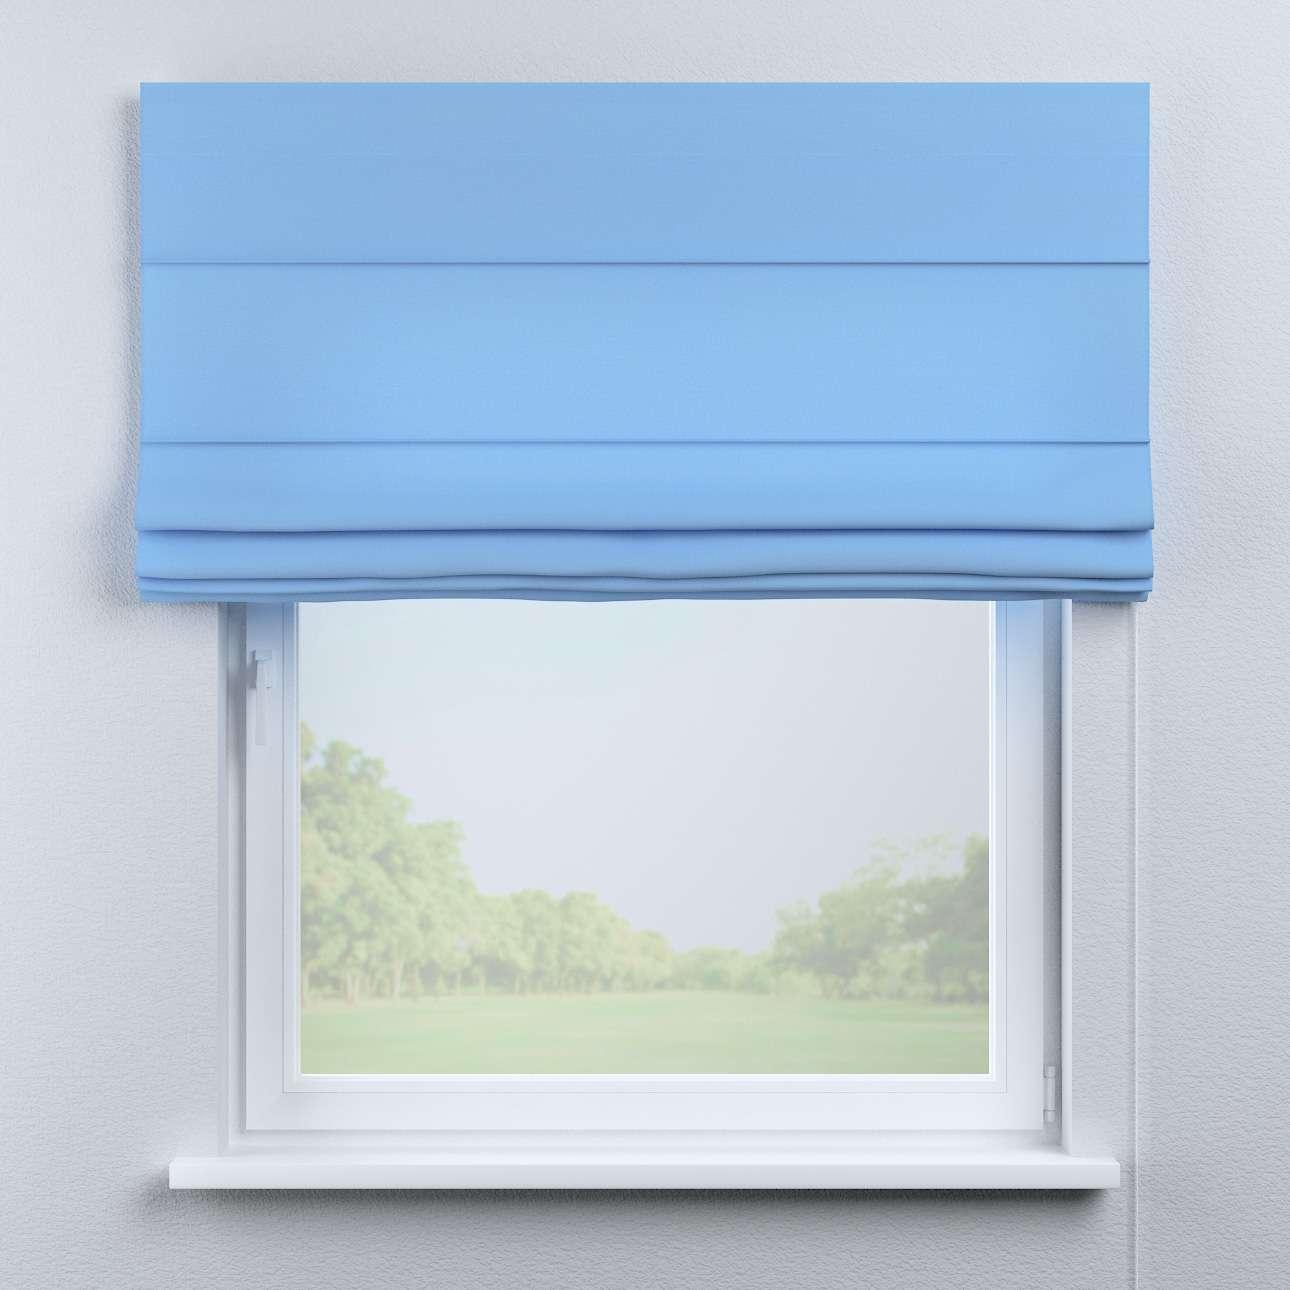 Foldegardin Capri<br/>Uden flæsekant 80 x 170 cm fra kollektionen Loneta, Stof: 133-21